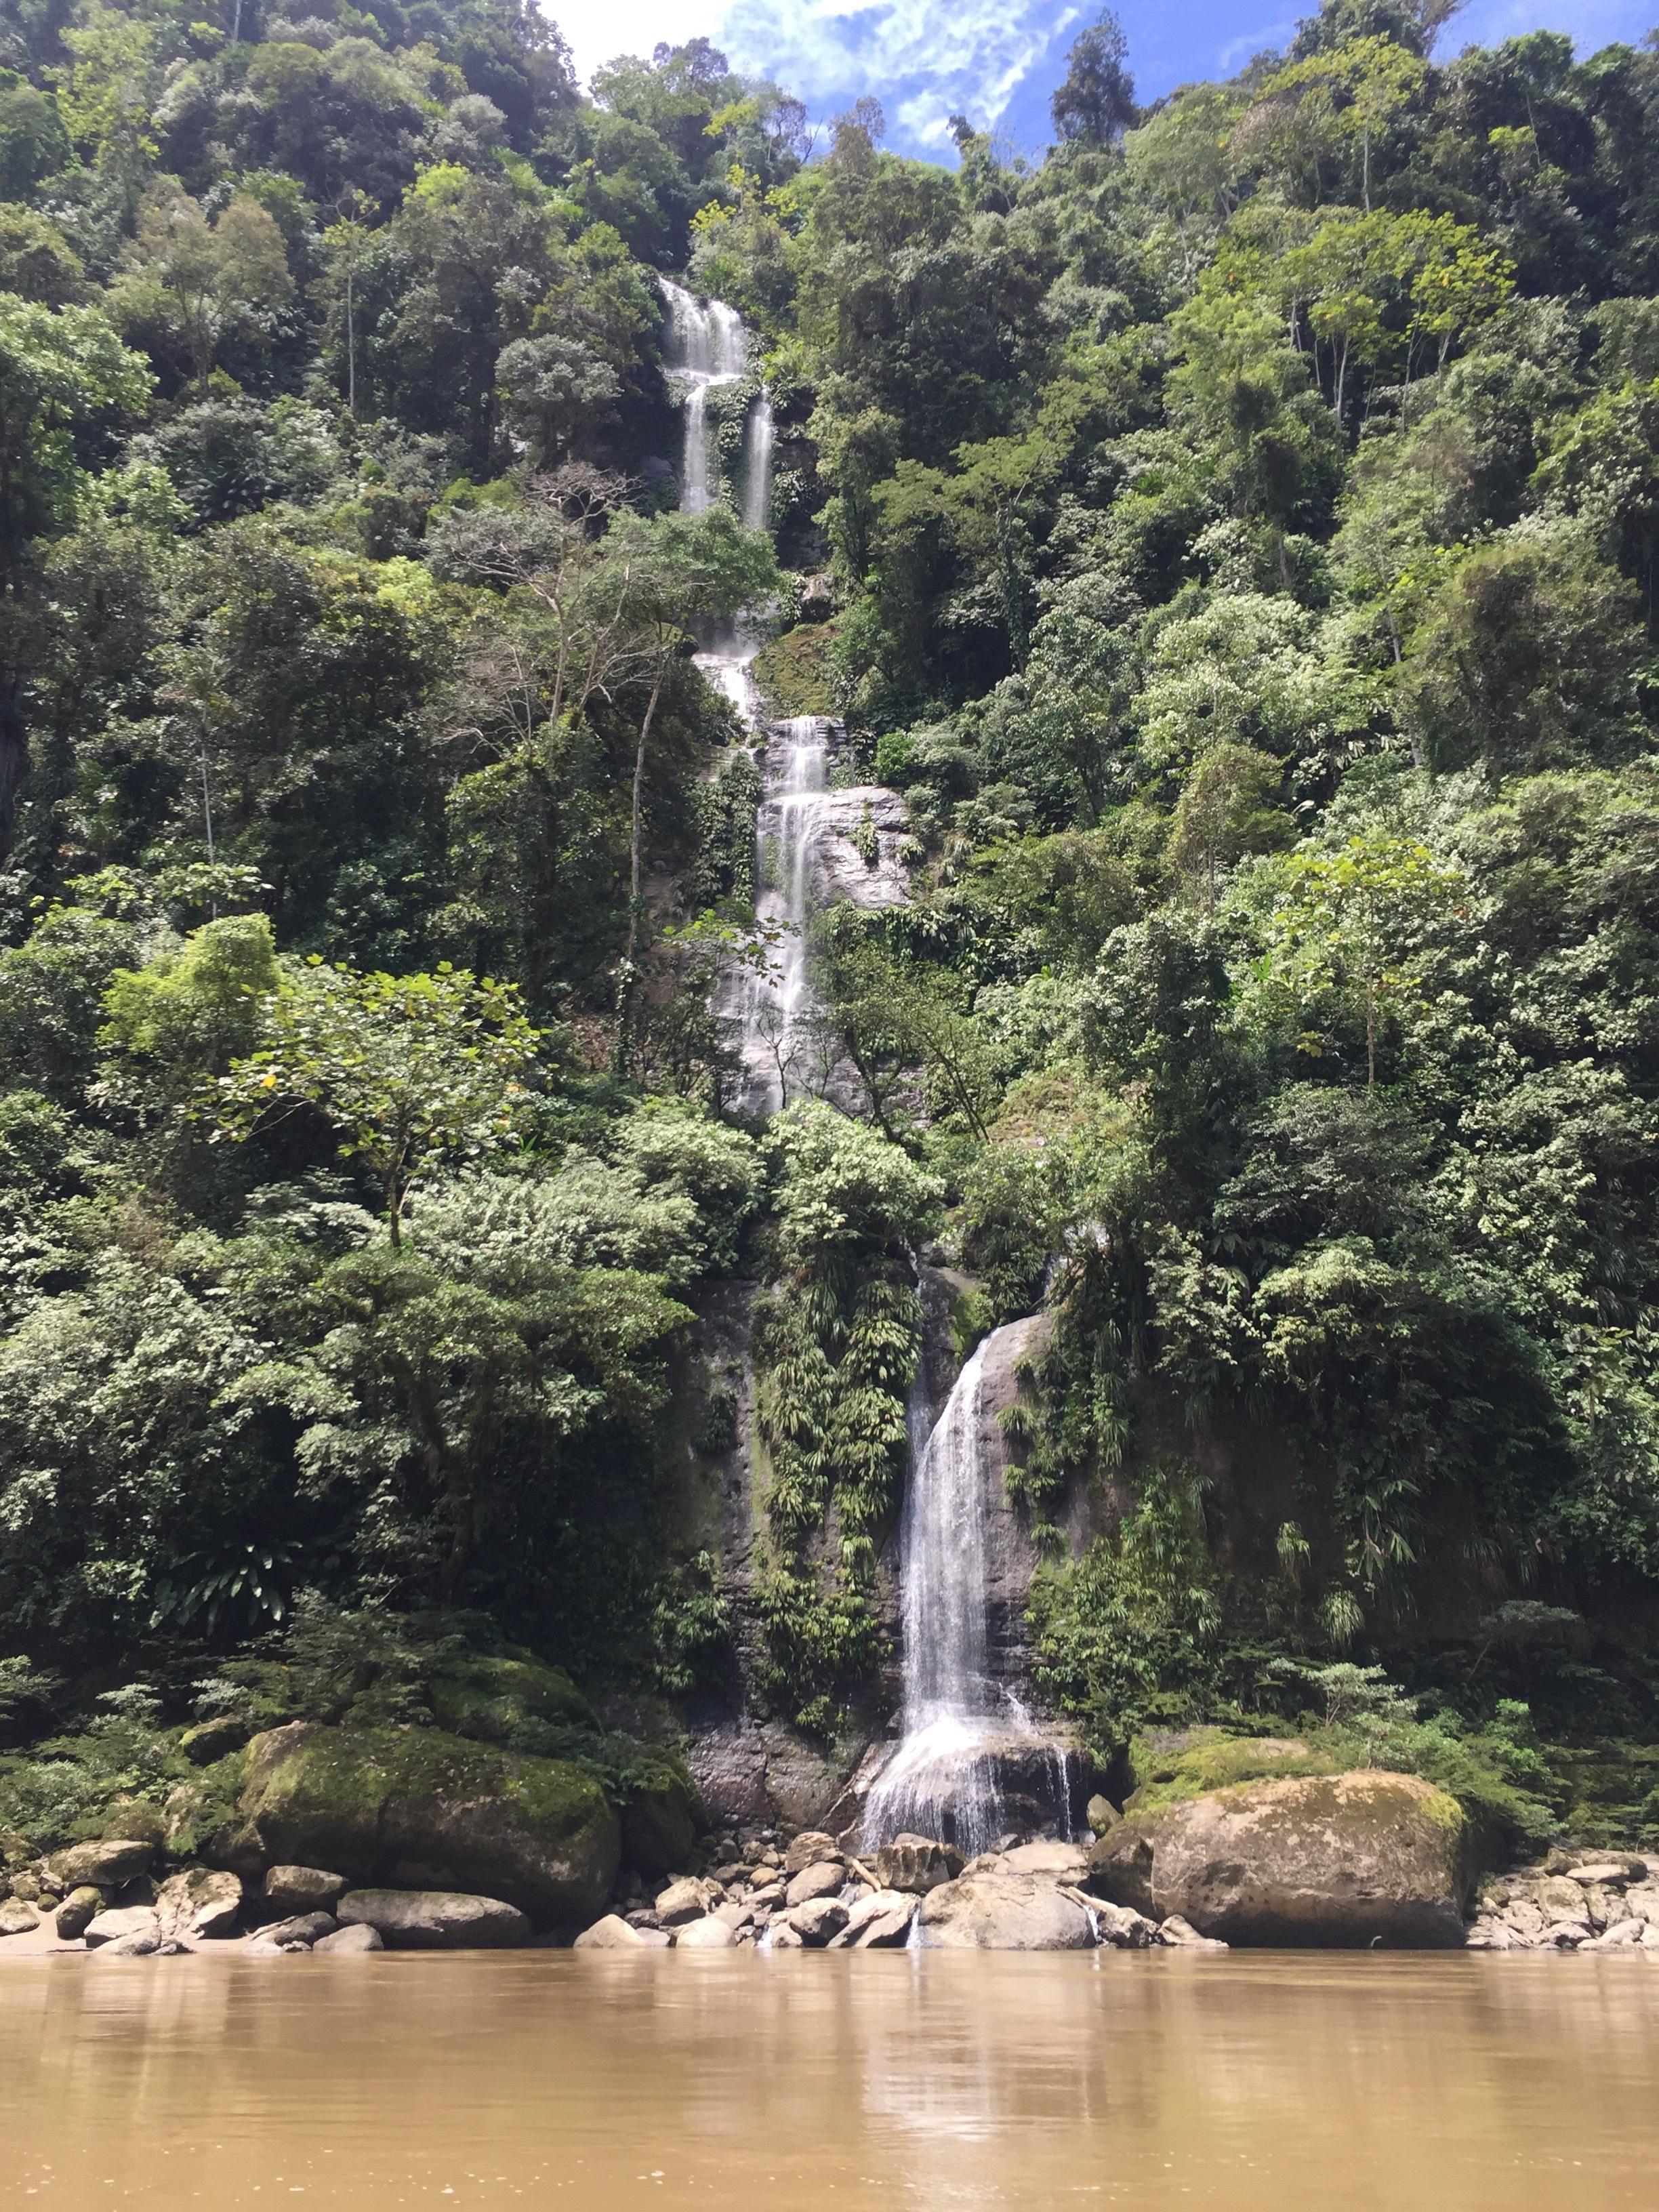 Coangos_waterfall_Goldlibrary_2017.jpg